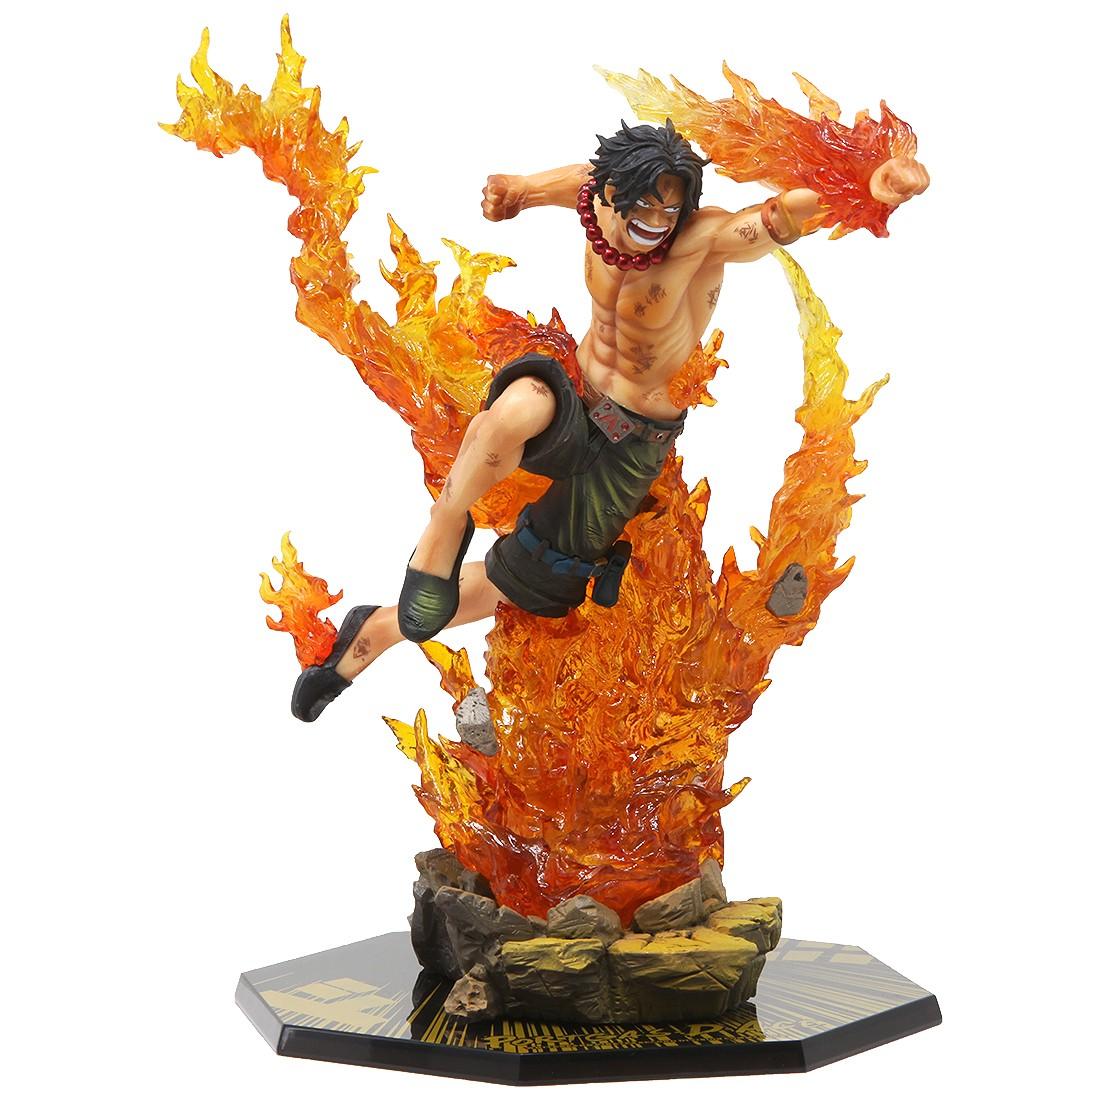 Bandai Figuarts Zero One Piece Portgas D. Ace Commander Of The Whitebeard 2nd Division Figure (orange)